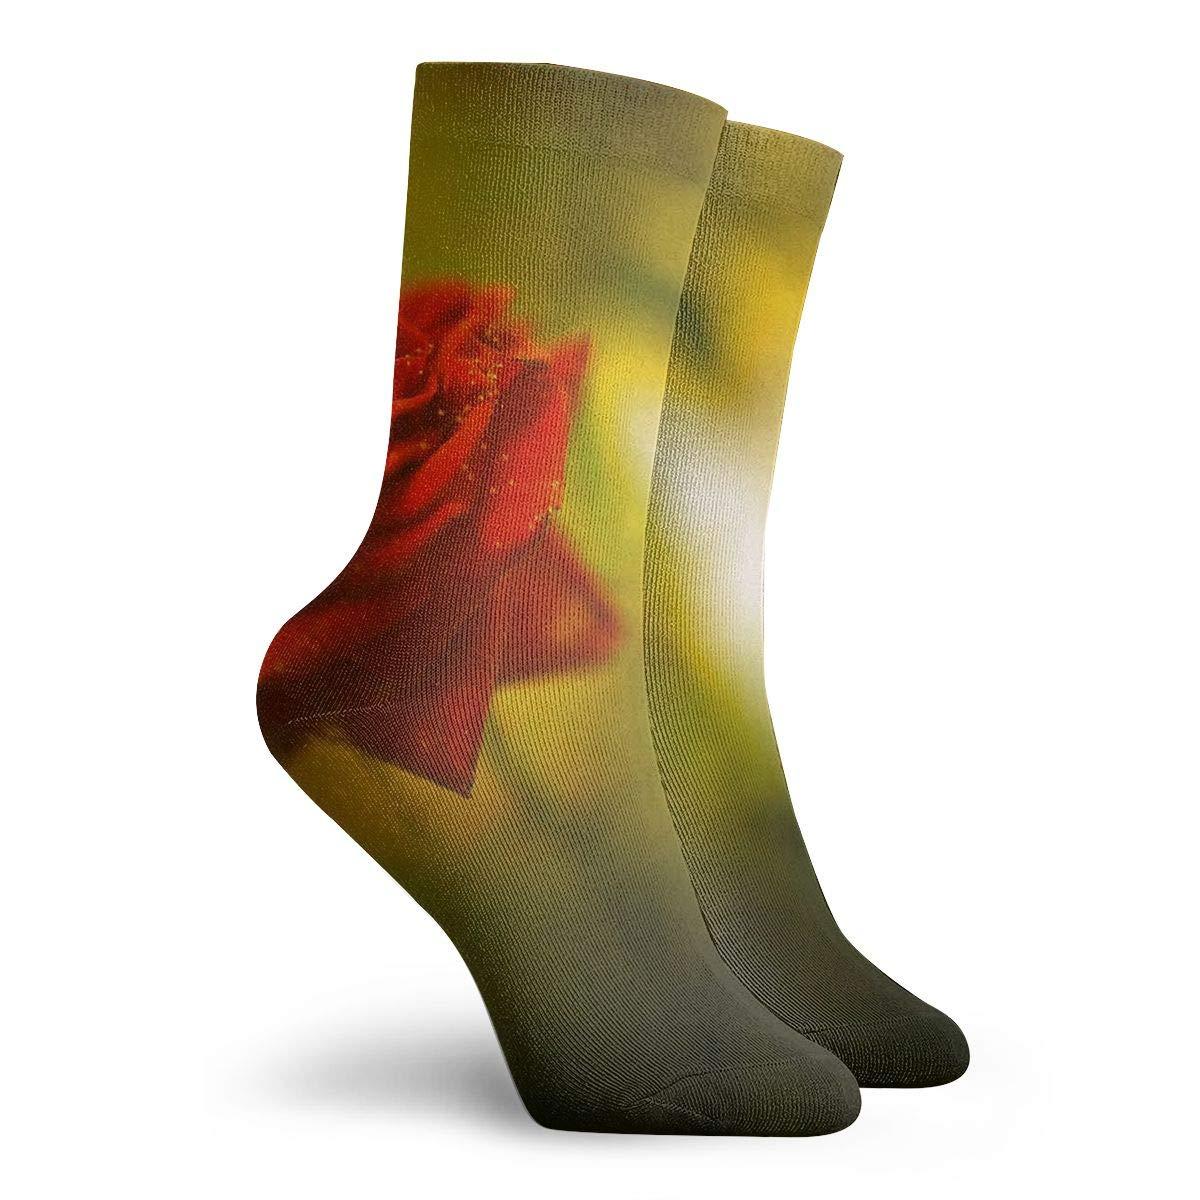 Unisex High Ankle Cushion Crew Socks Red Rose Casual Sport Socks